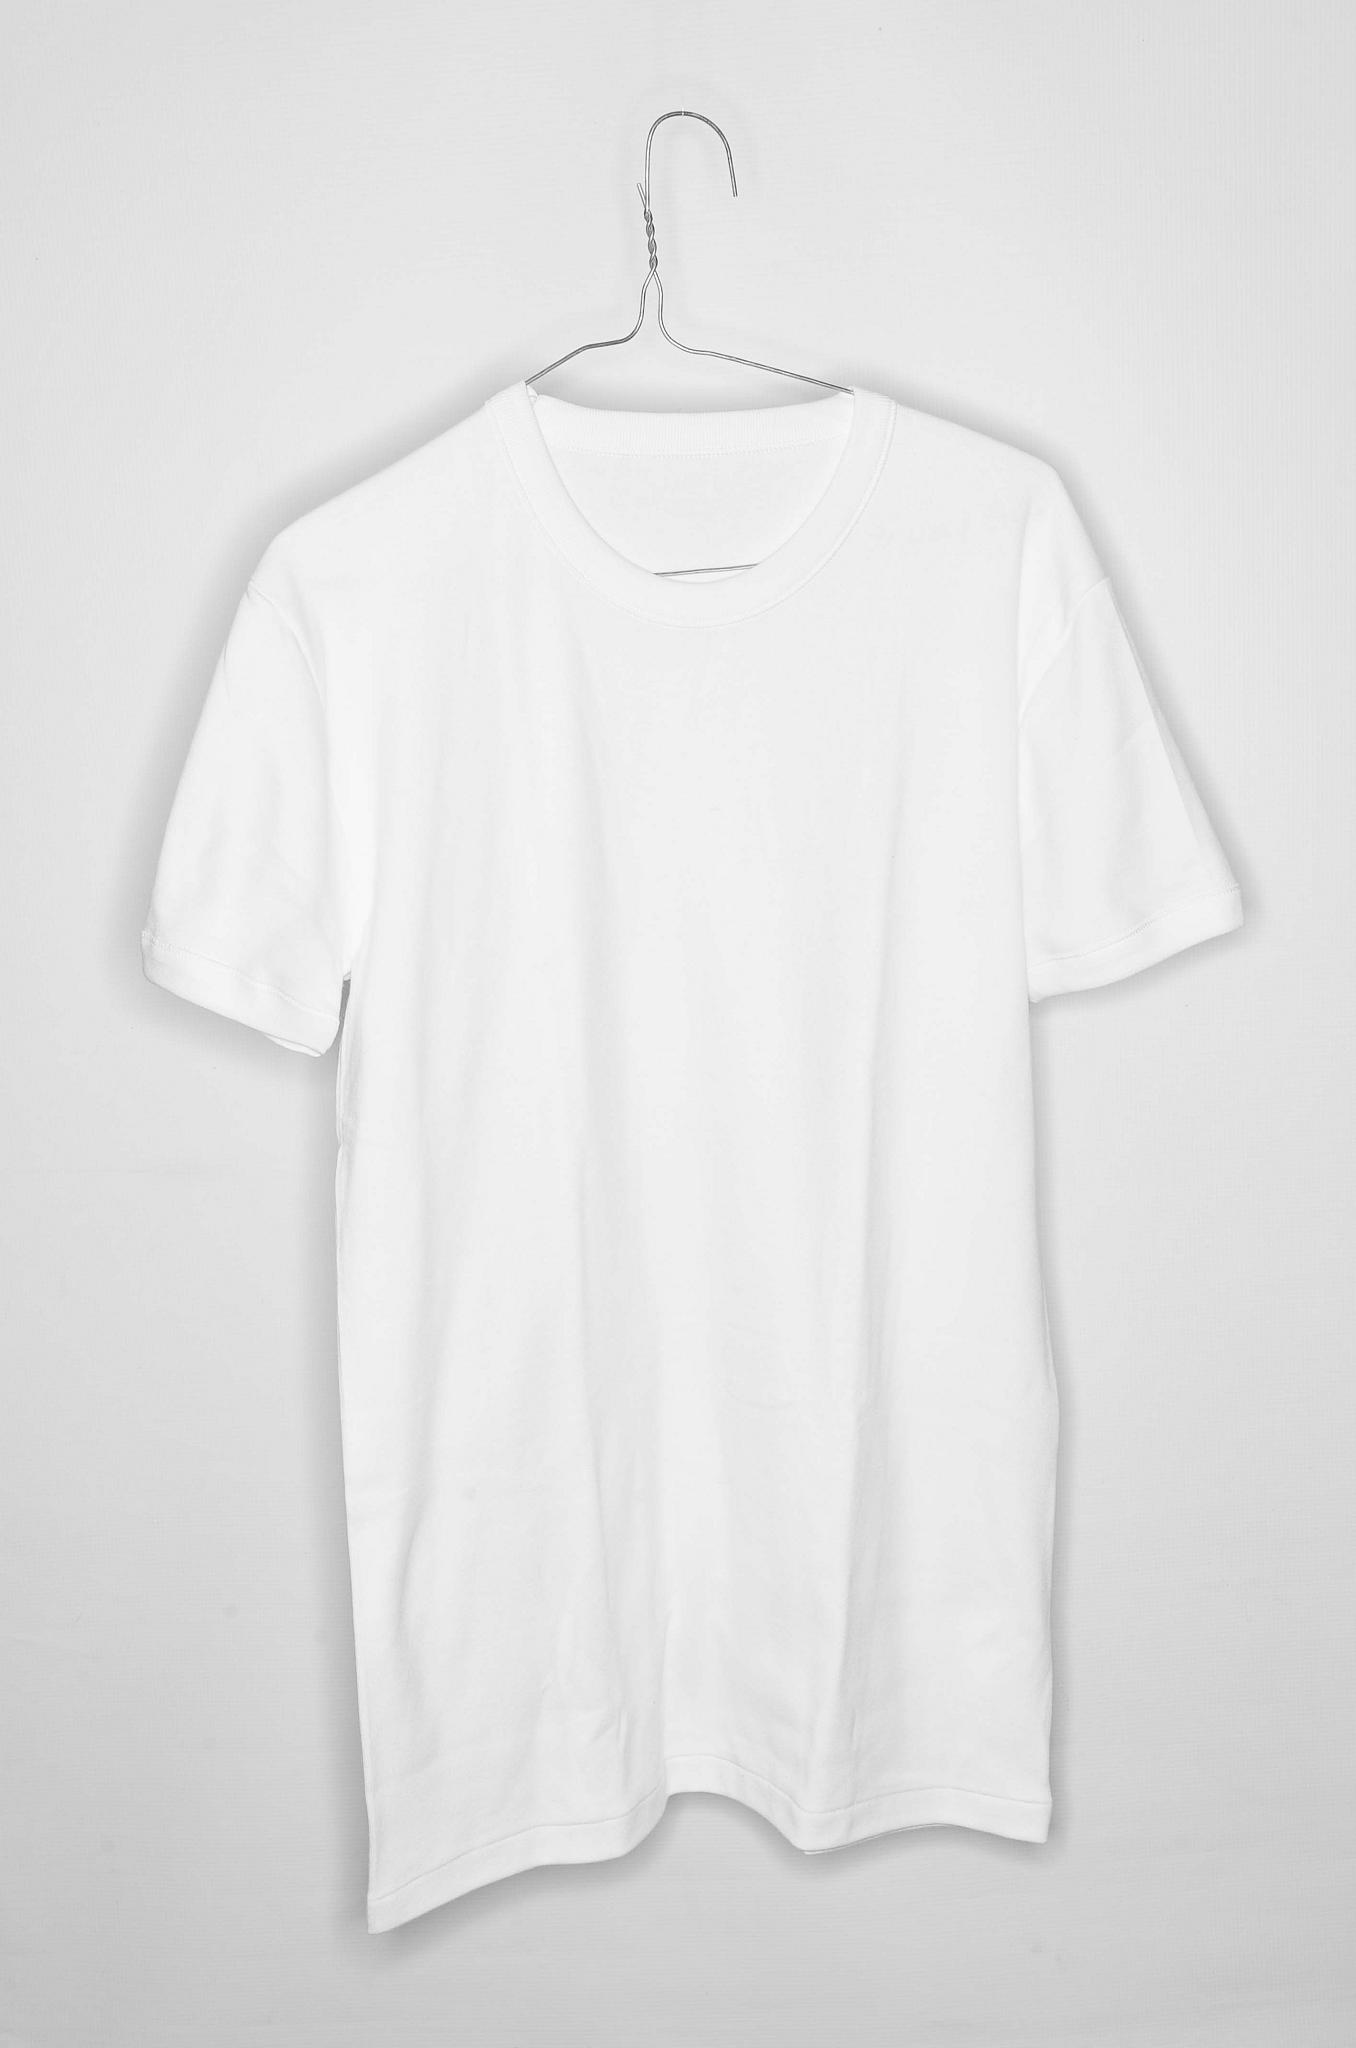 Ring Blank Chart: Ringflash Tshirt Blank Template (3214240974).jpg - Wikimedia ,Chart